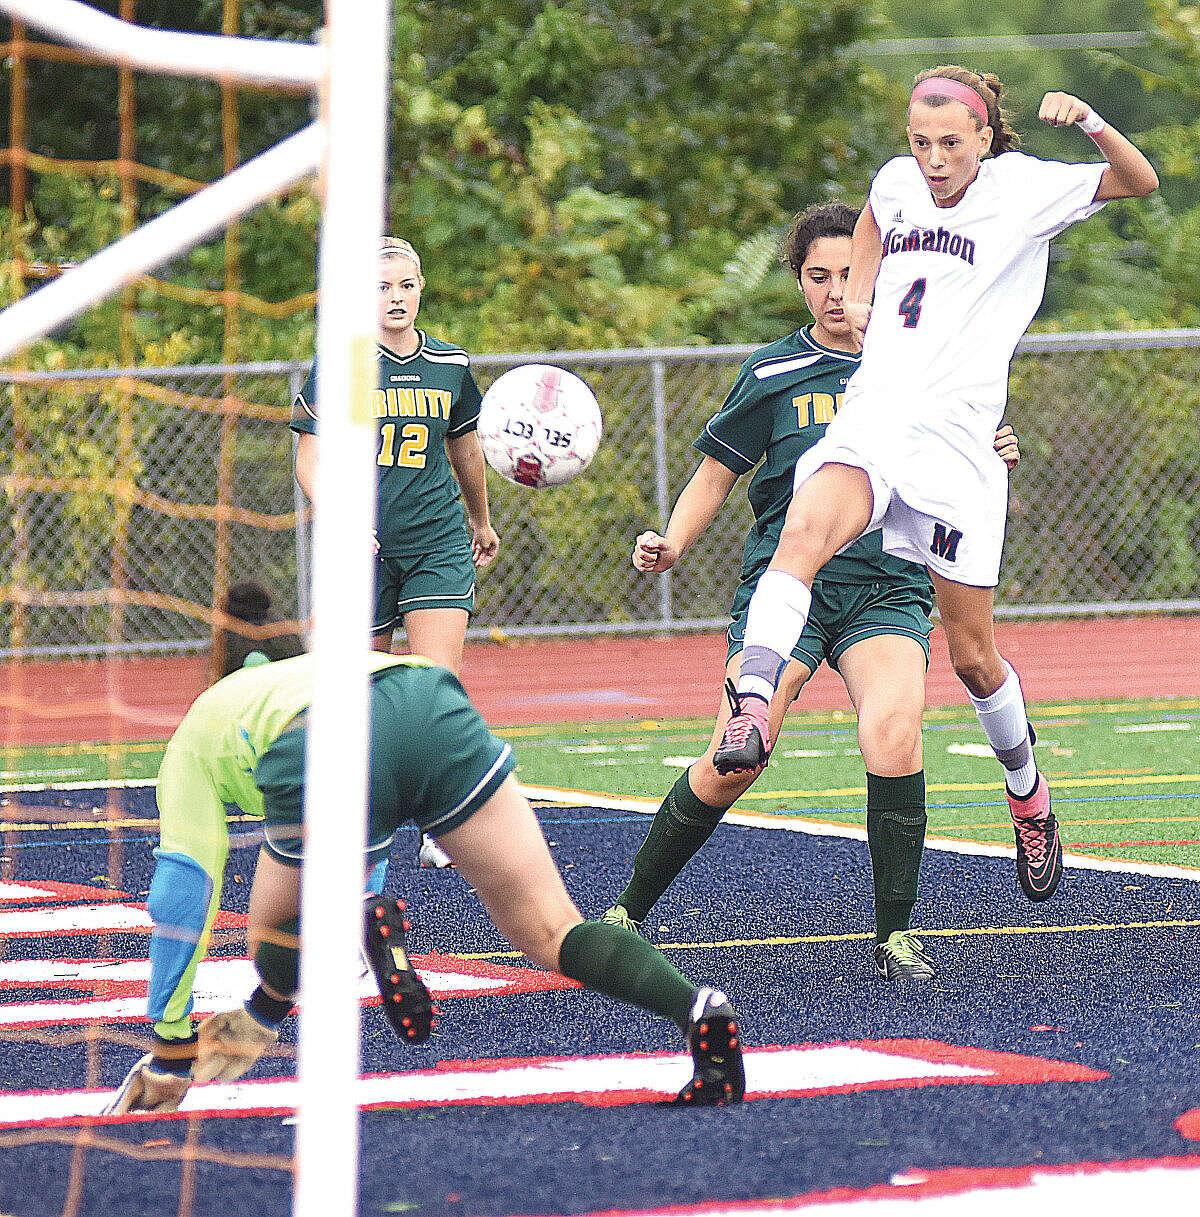 Hour photo/John Nash - Brien McMahon freshman Chloe Ortolano (4) blasts a goal into the net during Wednesday's FCIAC girls soccer game against Trinity Catholic.